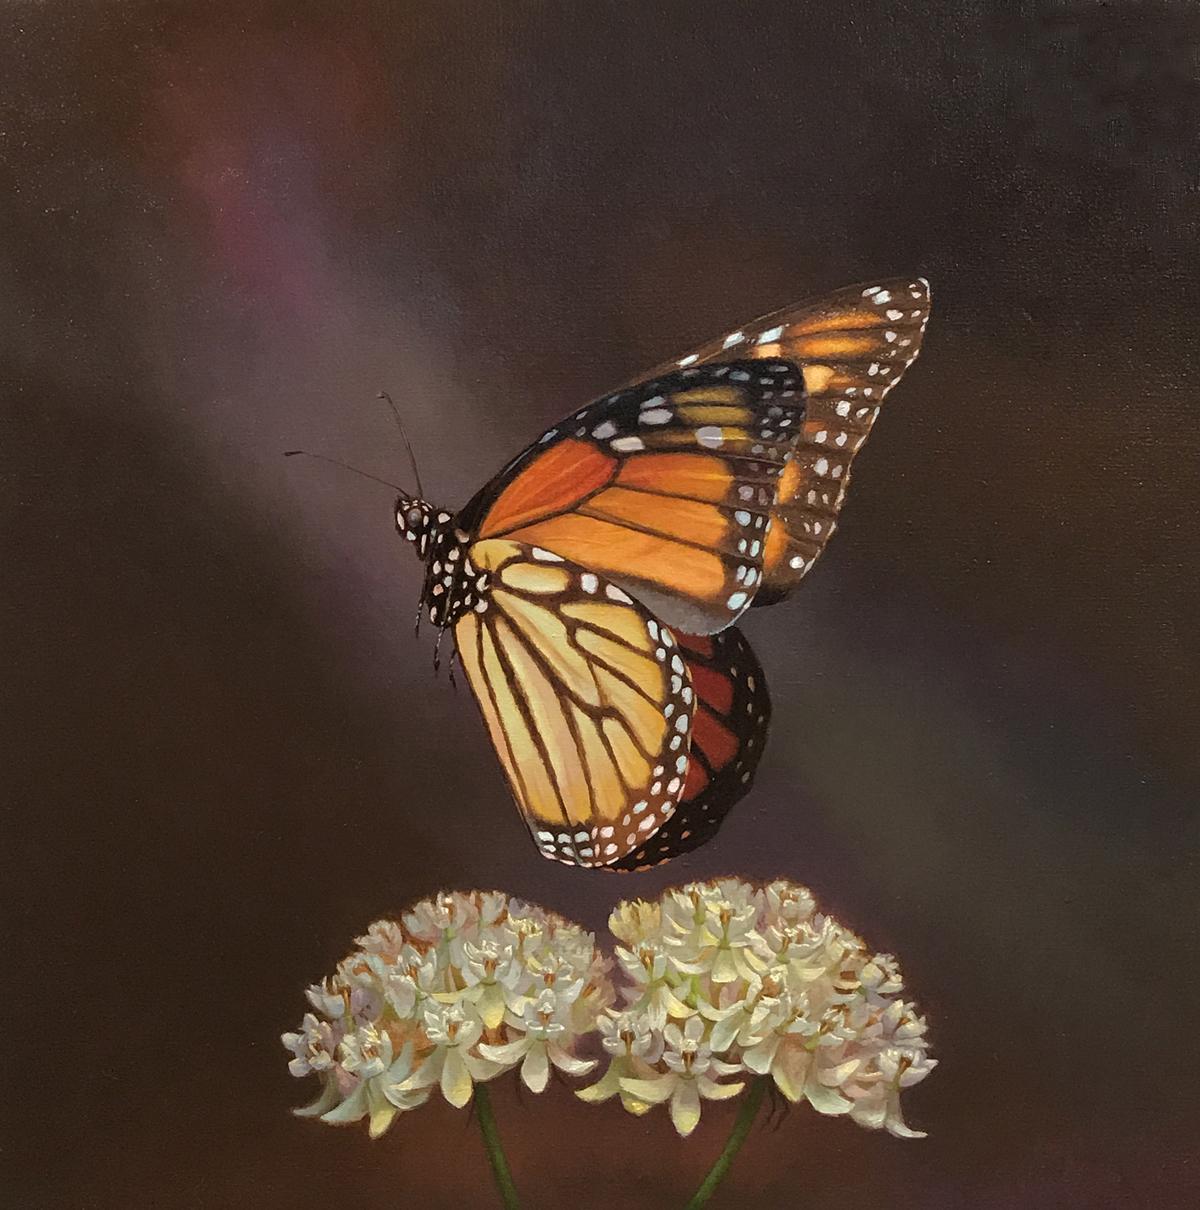 Monarch, Texas Millweed